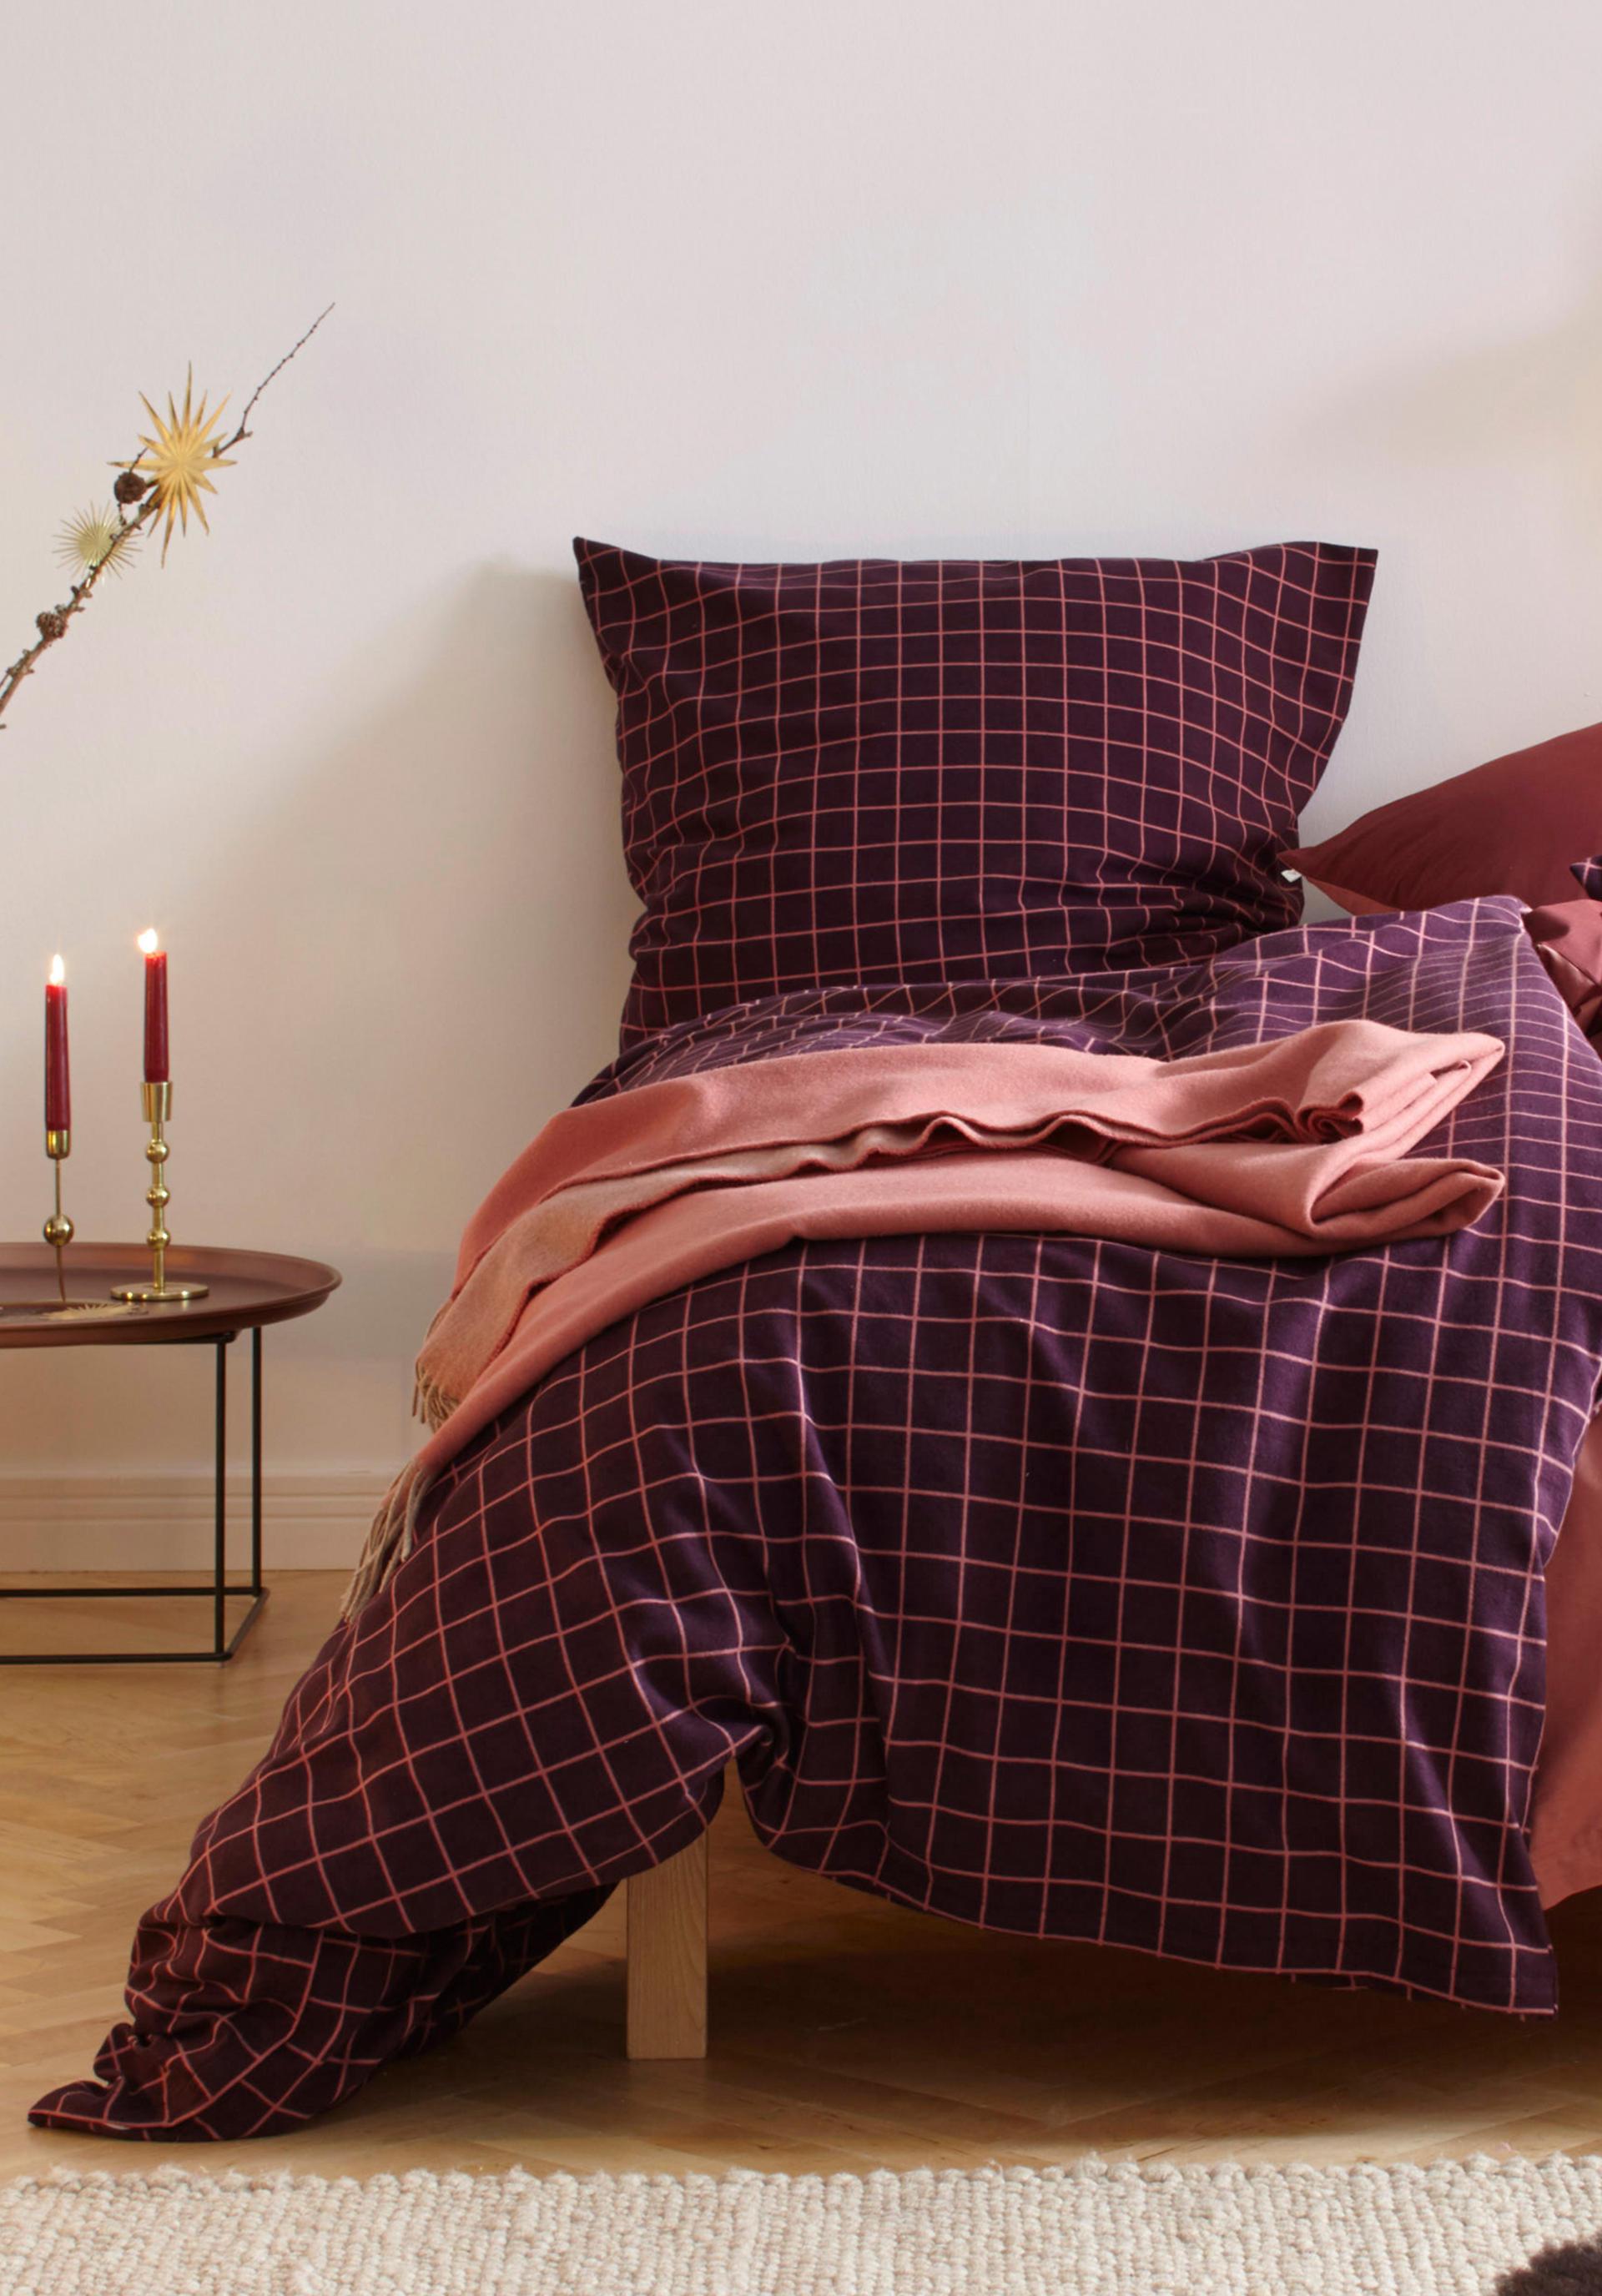 gnstige bettwsche 155x220 simple gnstige inspiration. Black Bedroom Furniture Sets. Home Design Ideas